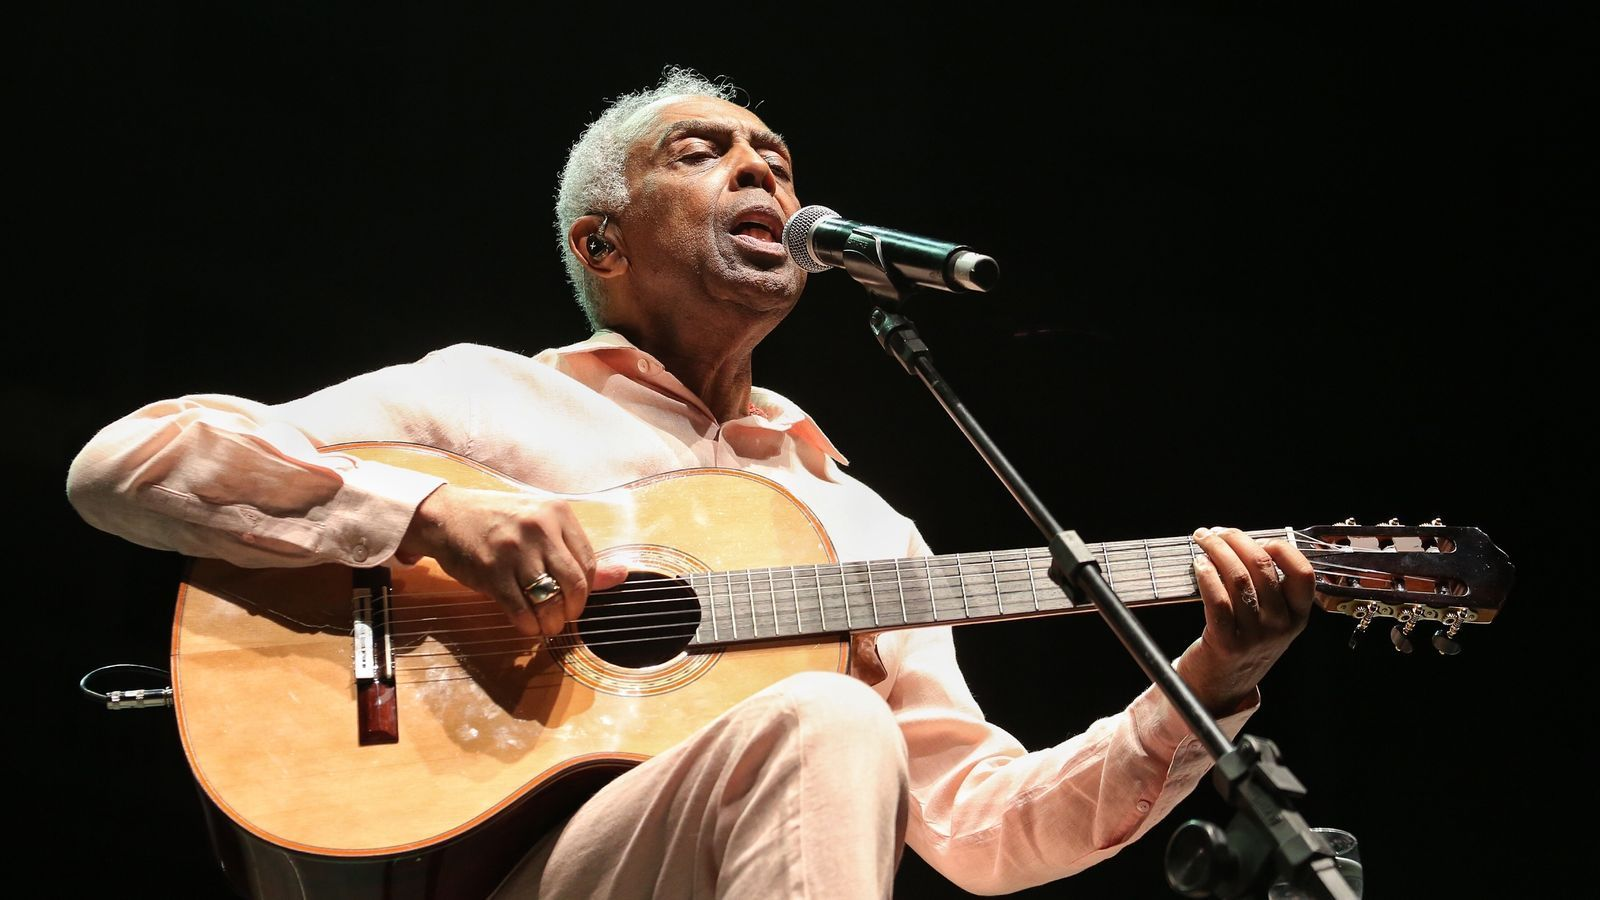 Gilberto Gil recorda Joao Gilberto als jardins de Pedralbes